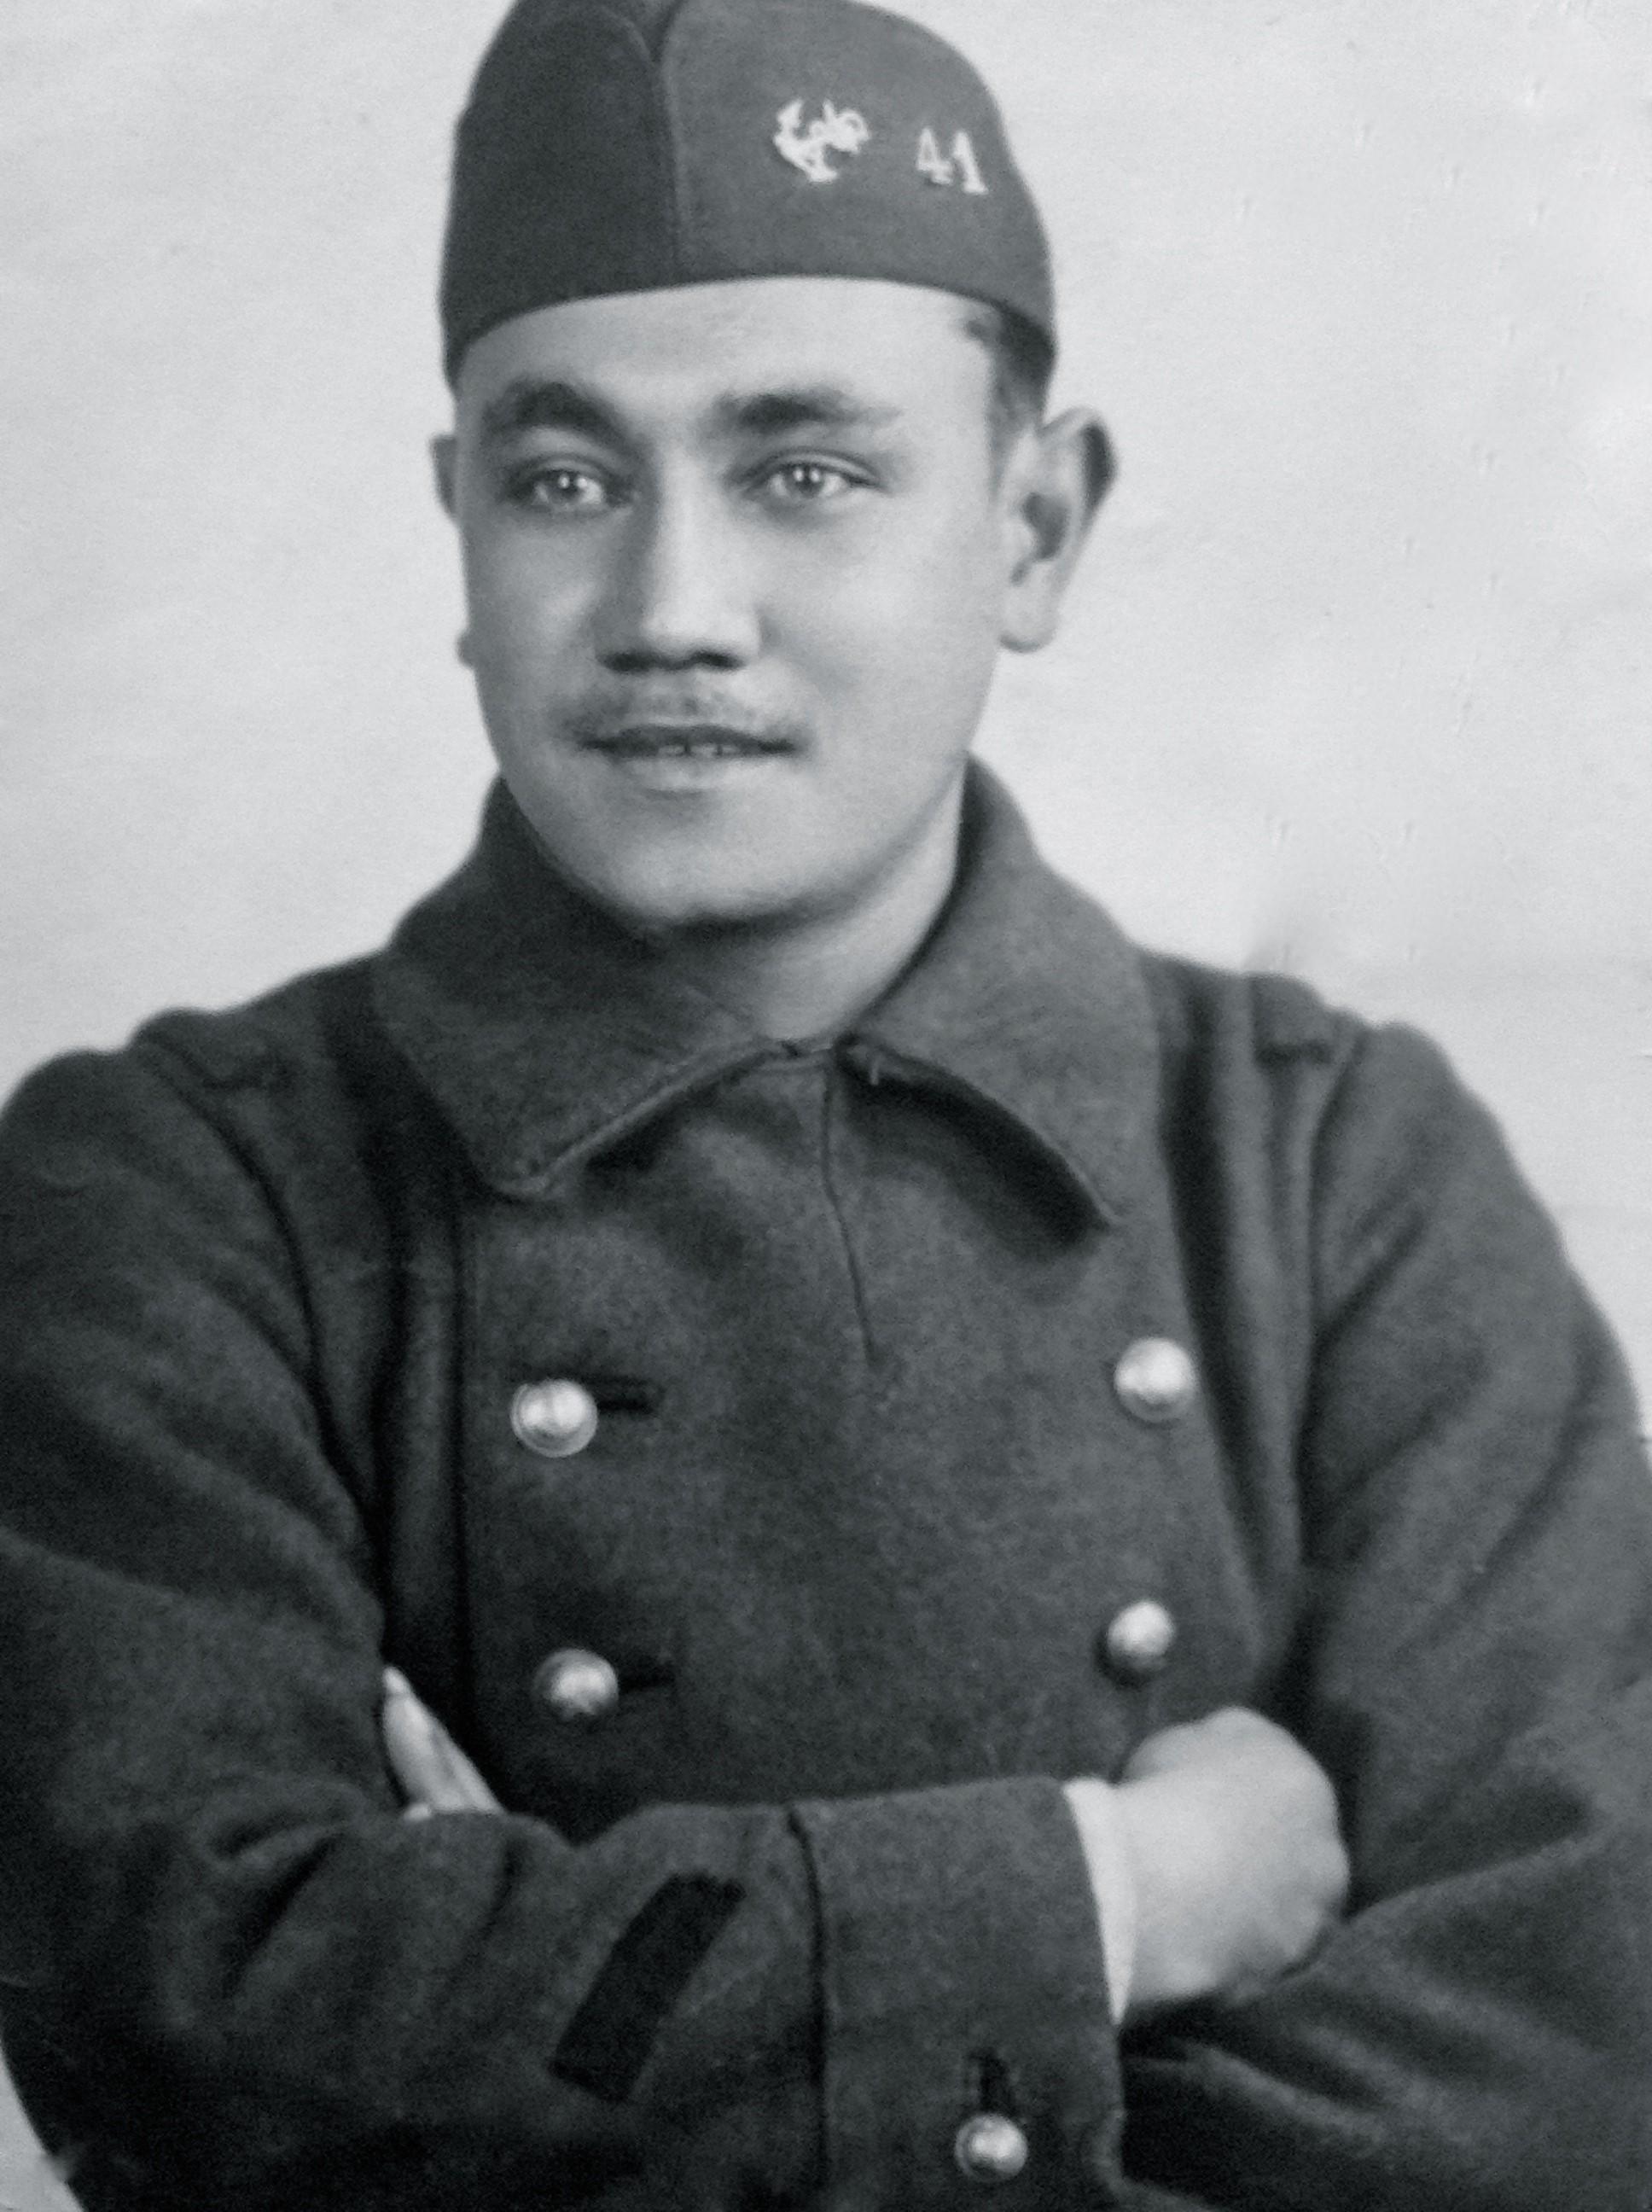 Le caporal Robert Lequerré